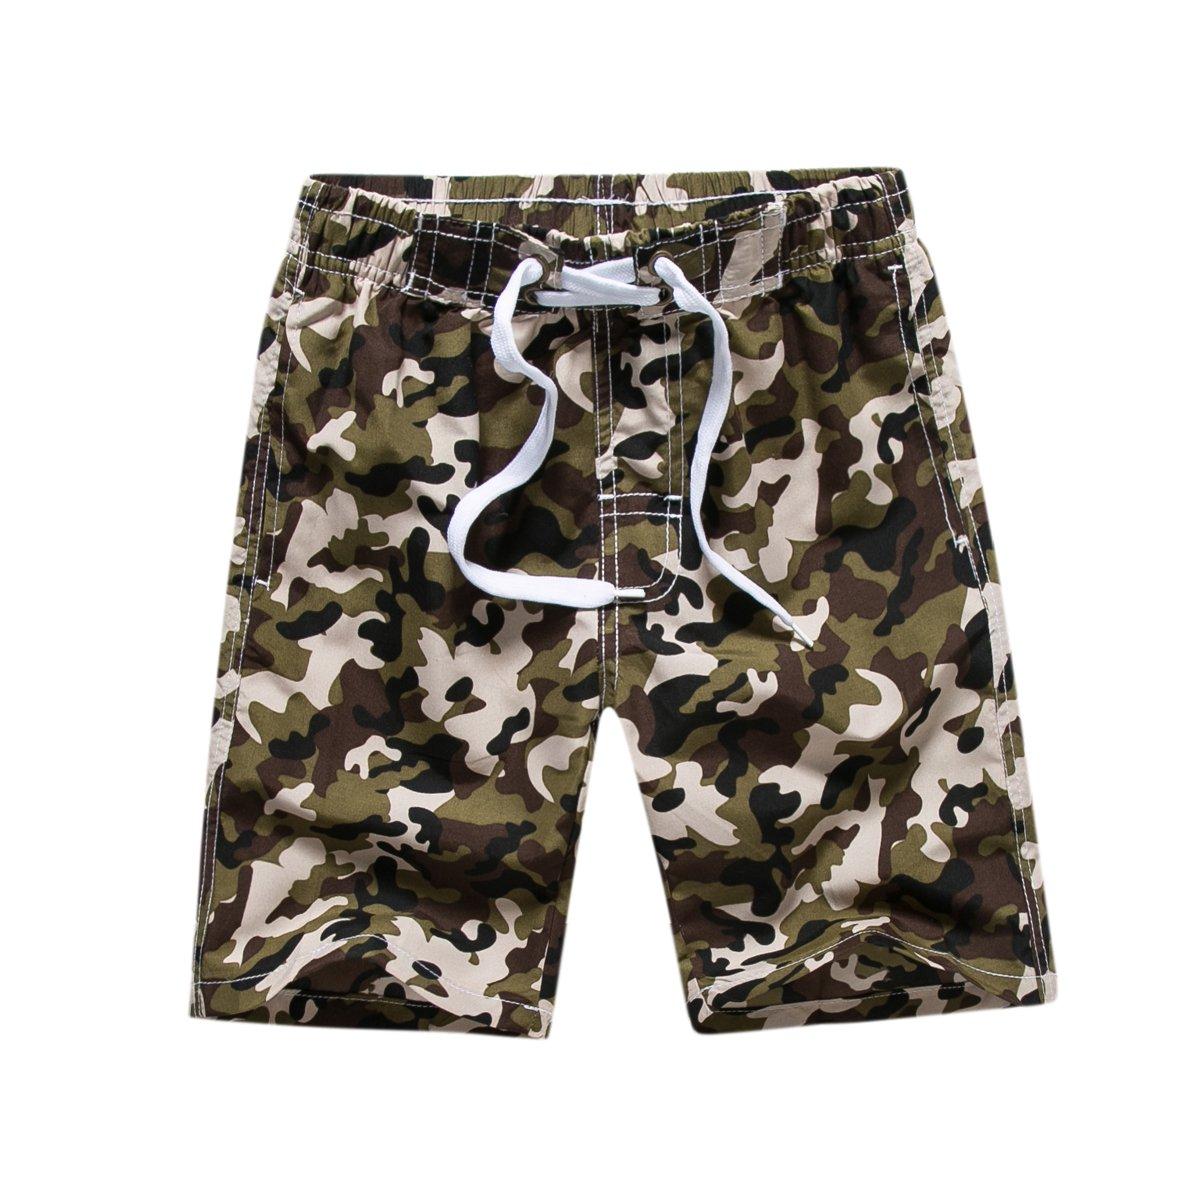 Kute 'n' Koo Big Boy's Swim Shorts, Quick Dry Camo Swim Trunks Boys Bathing Suits (14/16, Green)